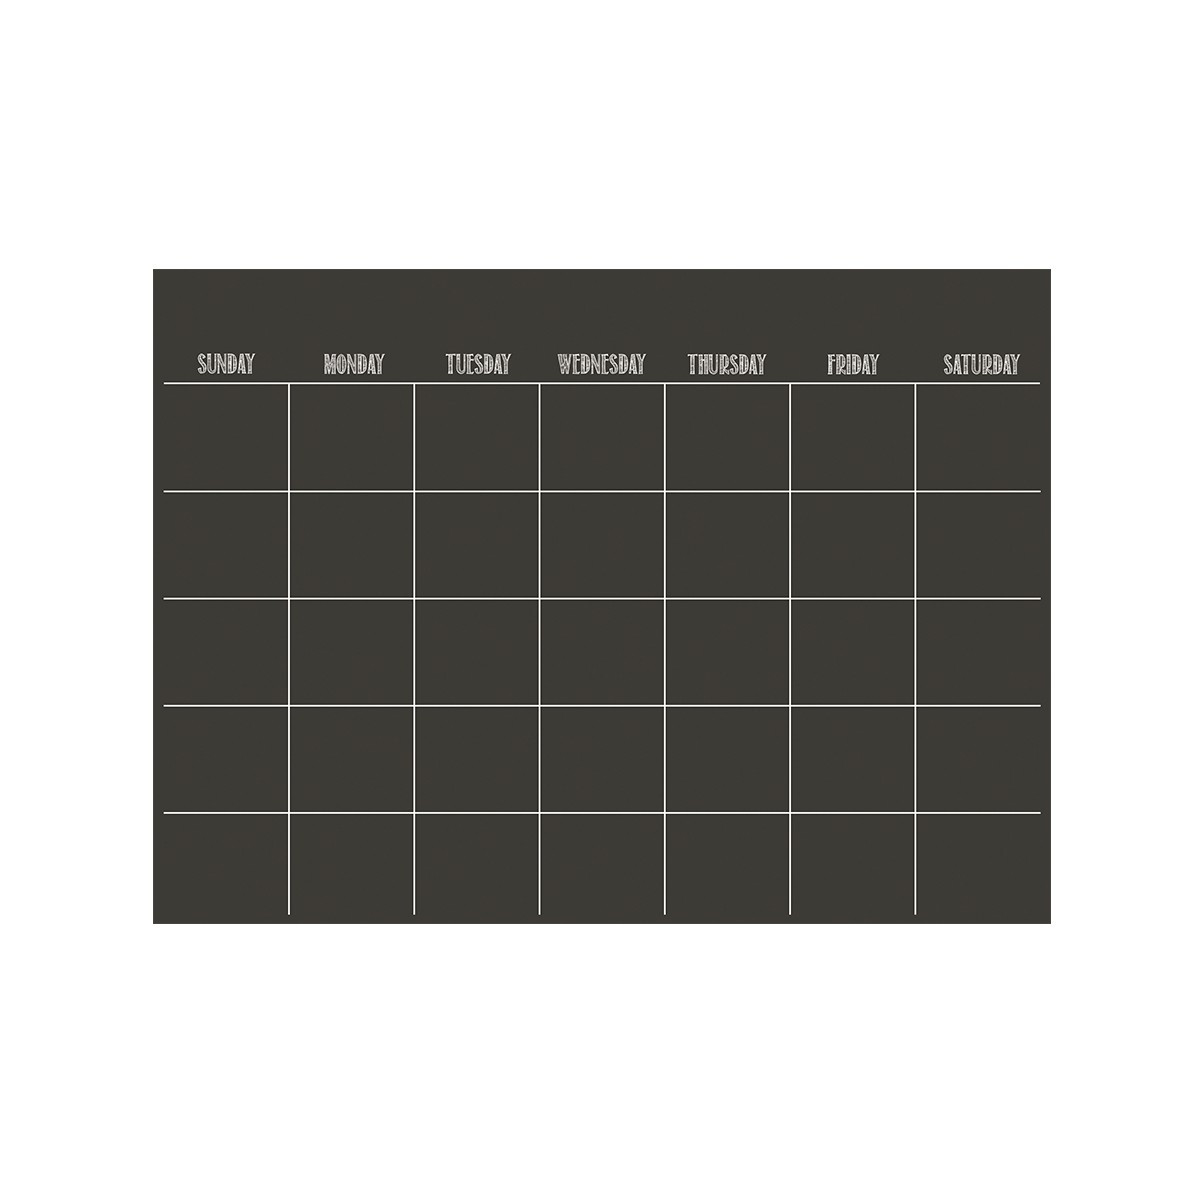 feuille adh sive noire avec planning mensuel. Black Bedroom Furniture Sets. Home Design Ideas